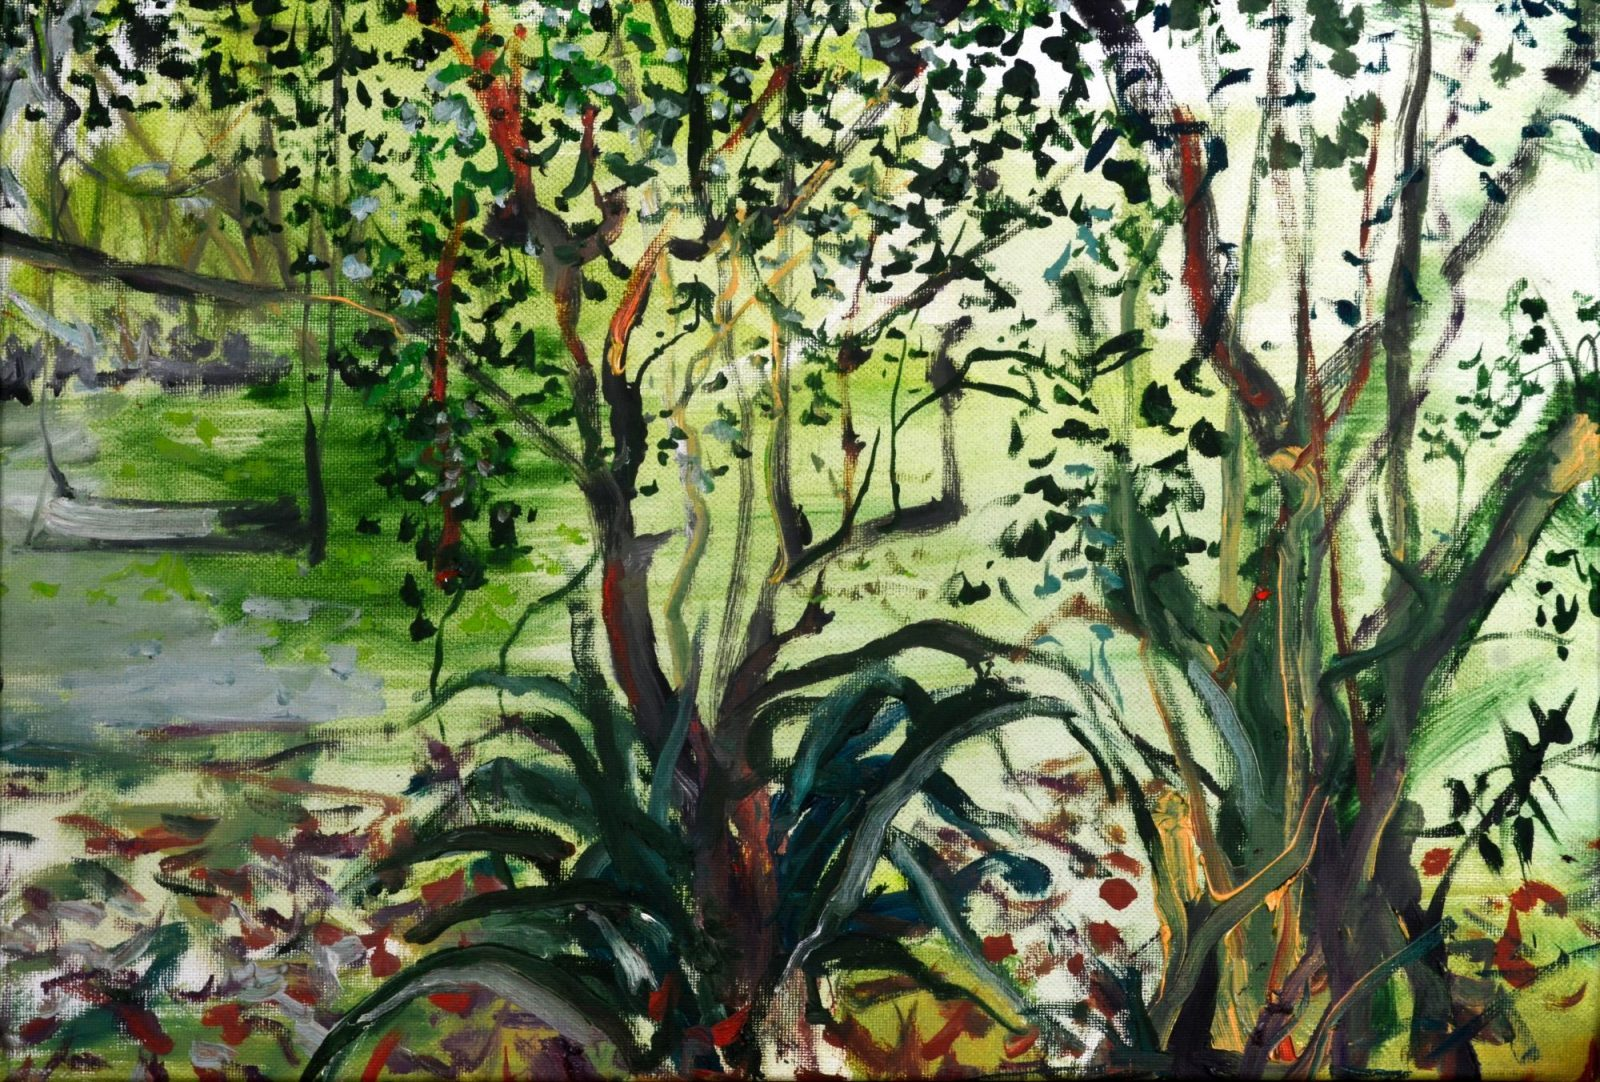 franyo aatoth: Garden Series 19.